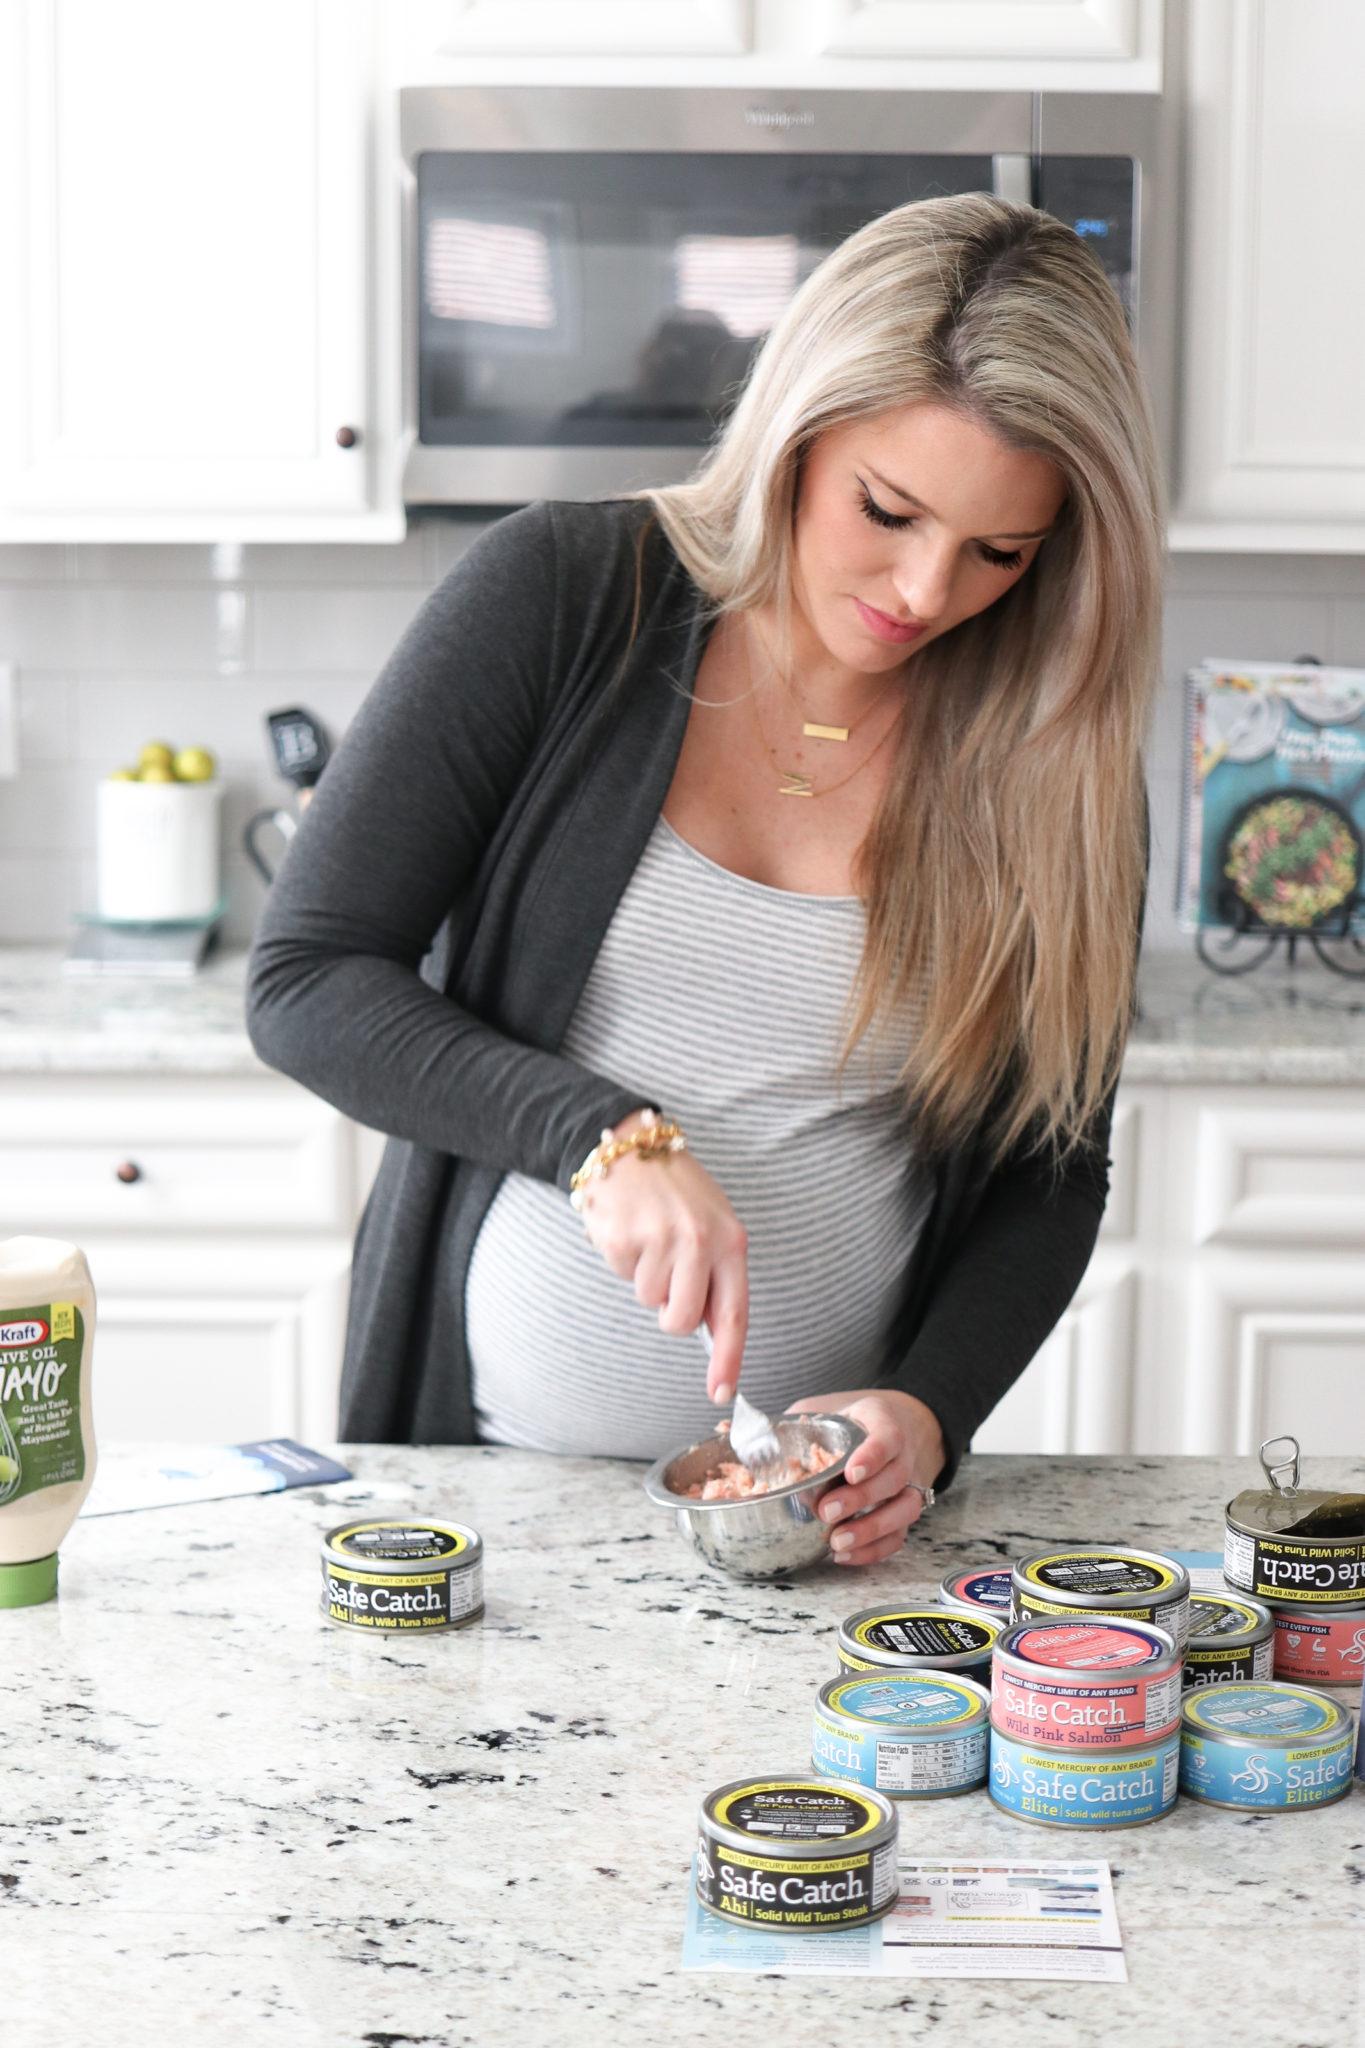 subway tuna ok for pregnancy / eating tuna while pregnant